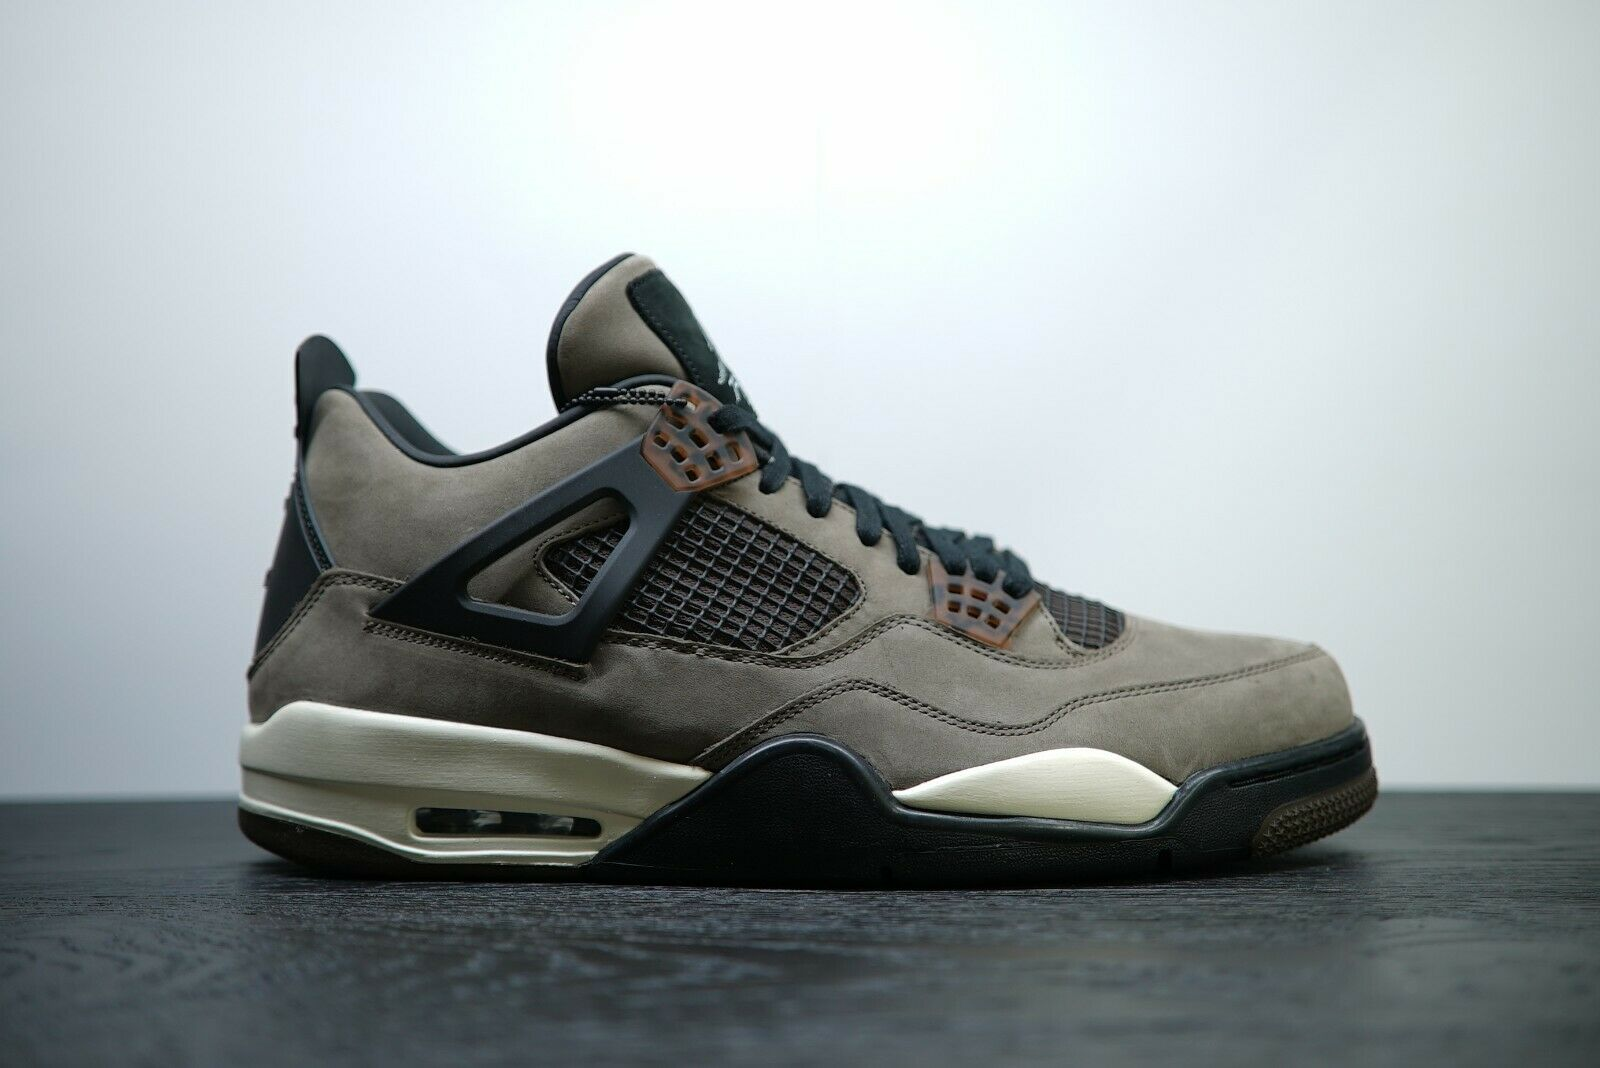 DS Nike Air Jordan IV 4 Retro MOCHA TRAVIS SCOTT FRIENDS AND FAMILY SAMPLE 13